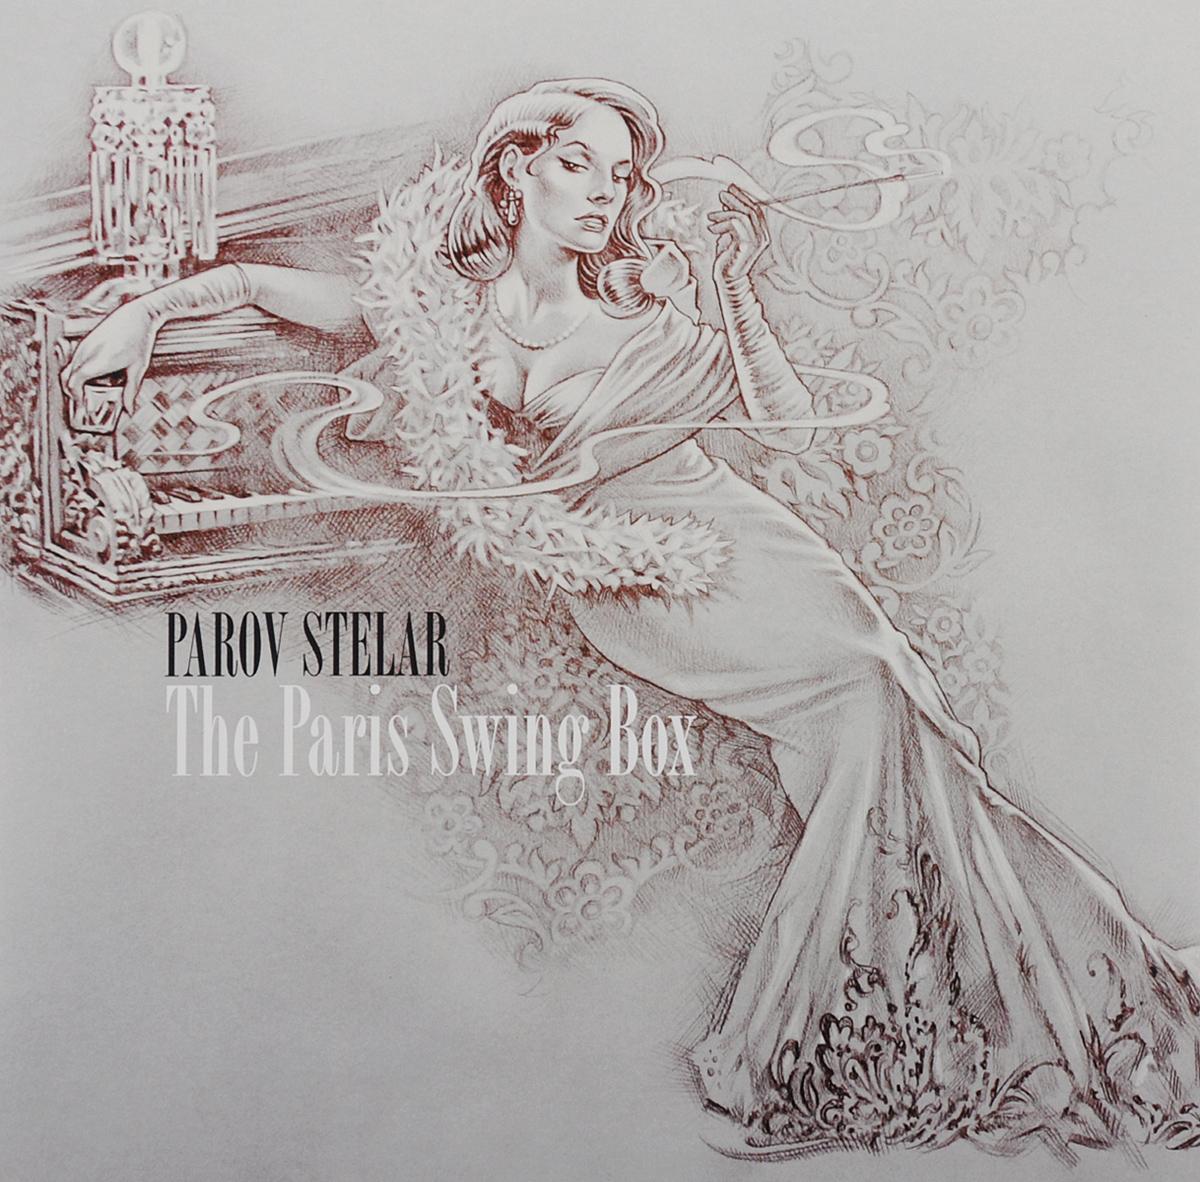 Parov Stelar. The Paris Swing Box (2 LP)